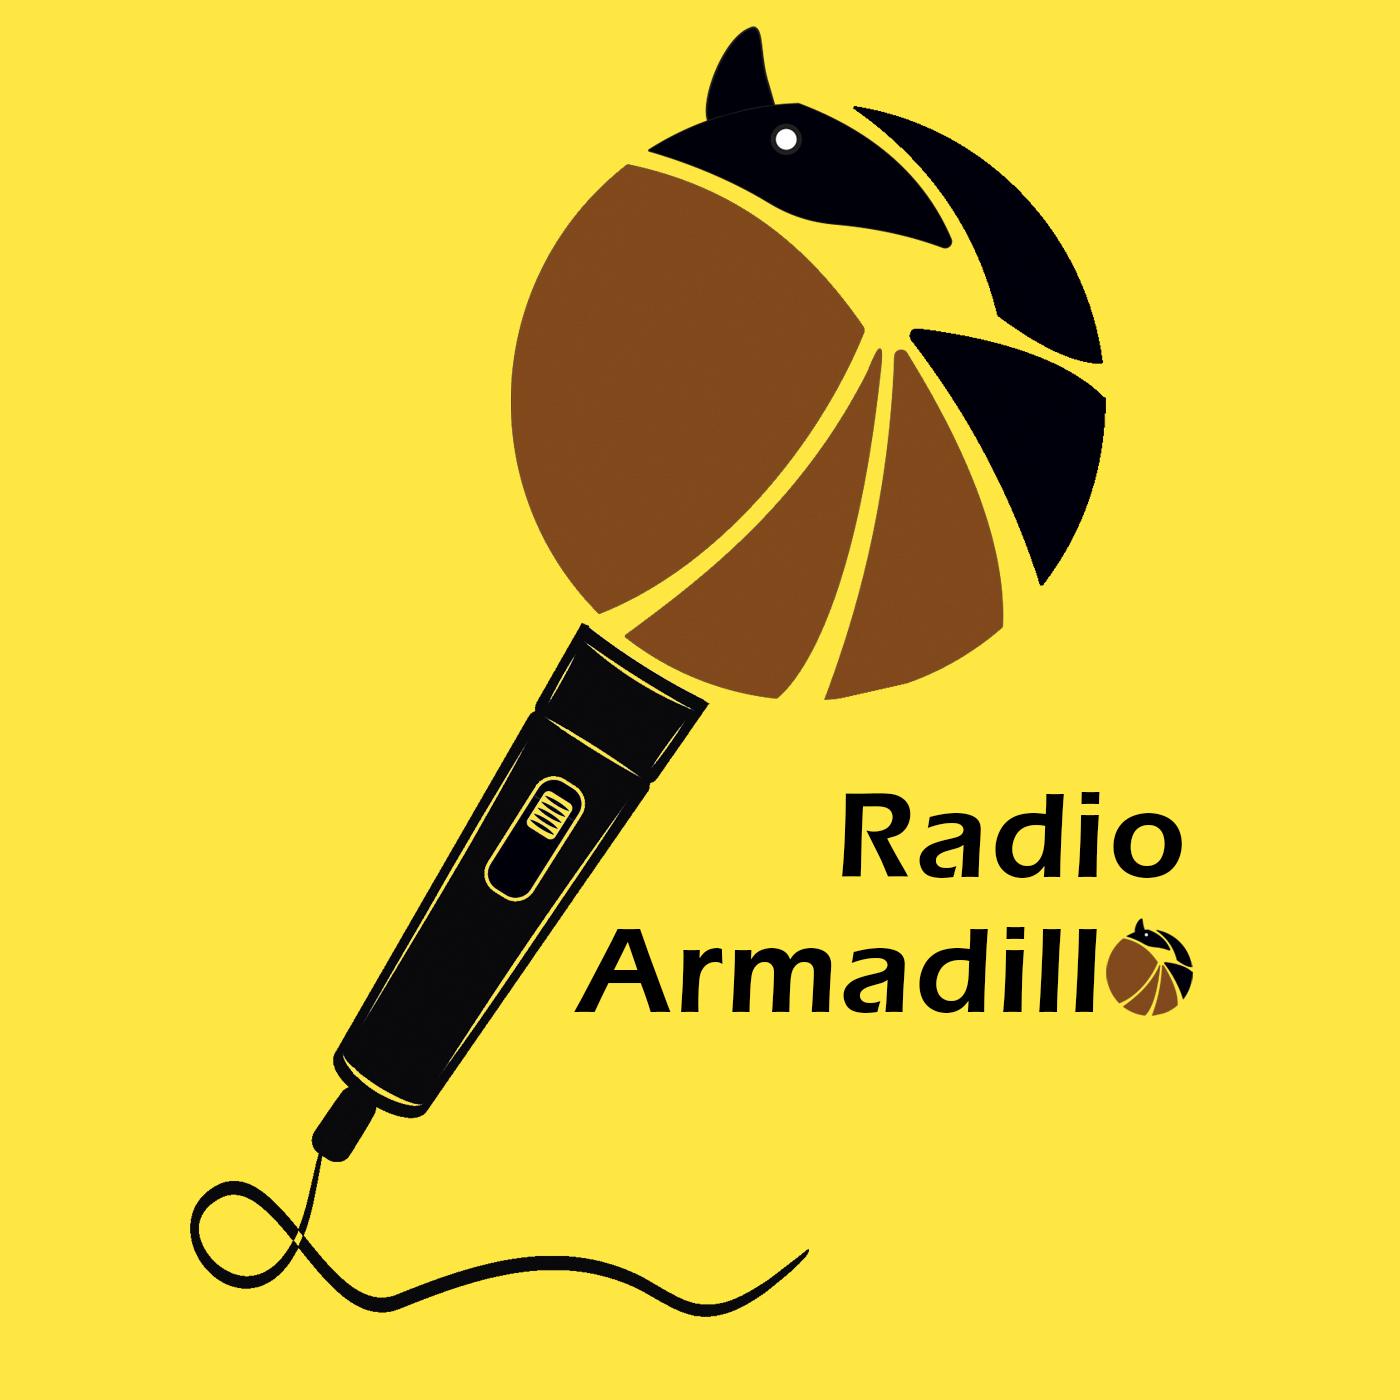 رادیو آرمادیلو فارسی